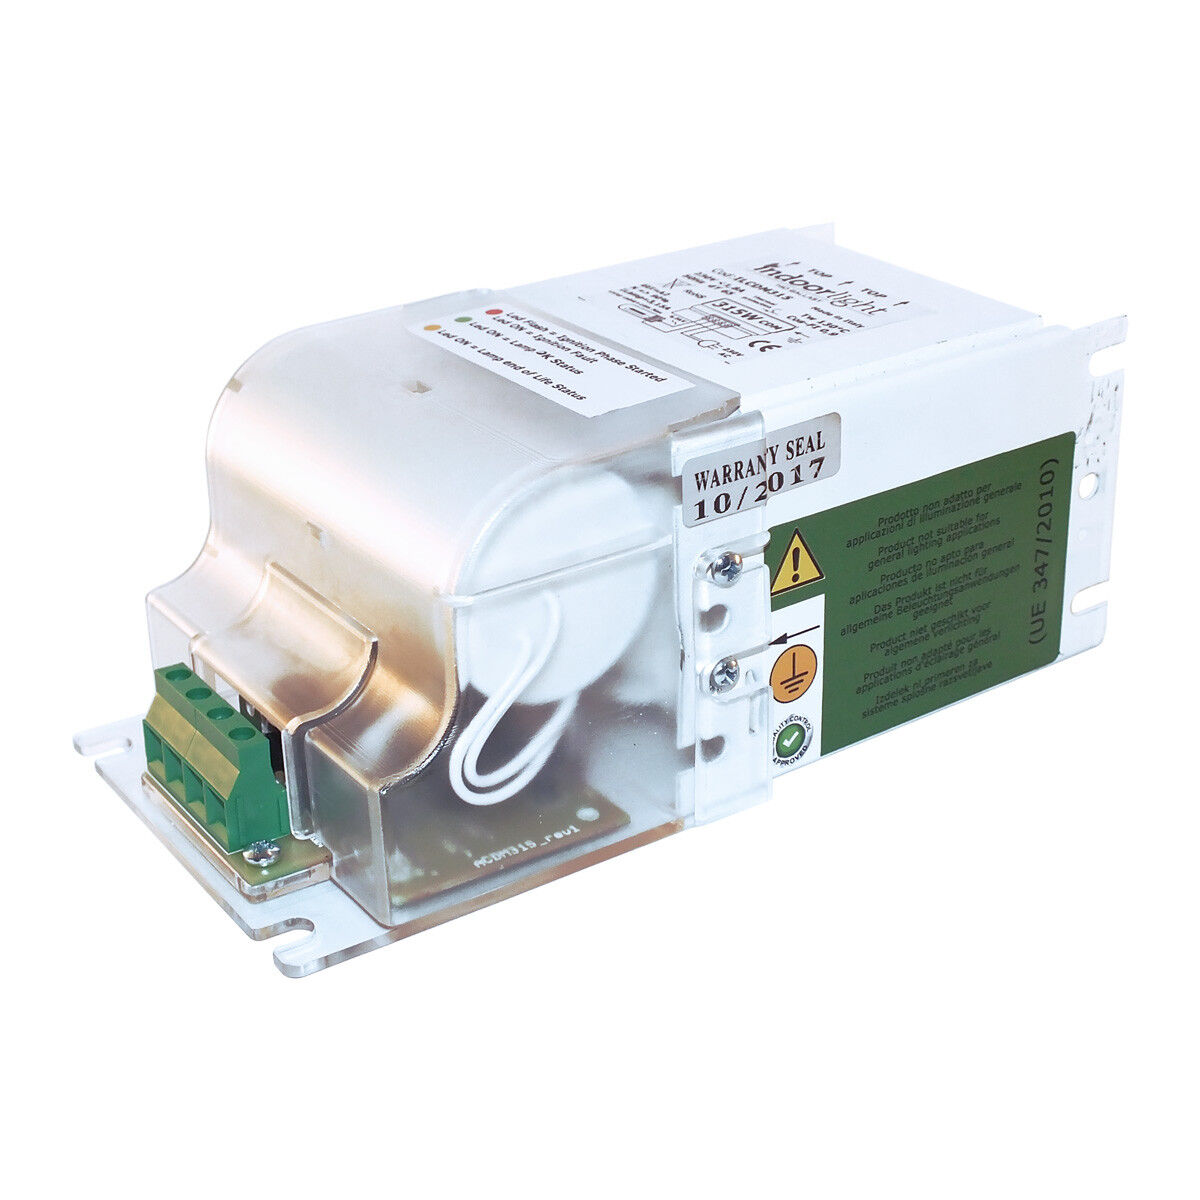 Accenditore Alimentatore Ballast INDOORLIGHT Intellidrive Lampade CMH LEC 315W g